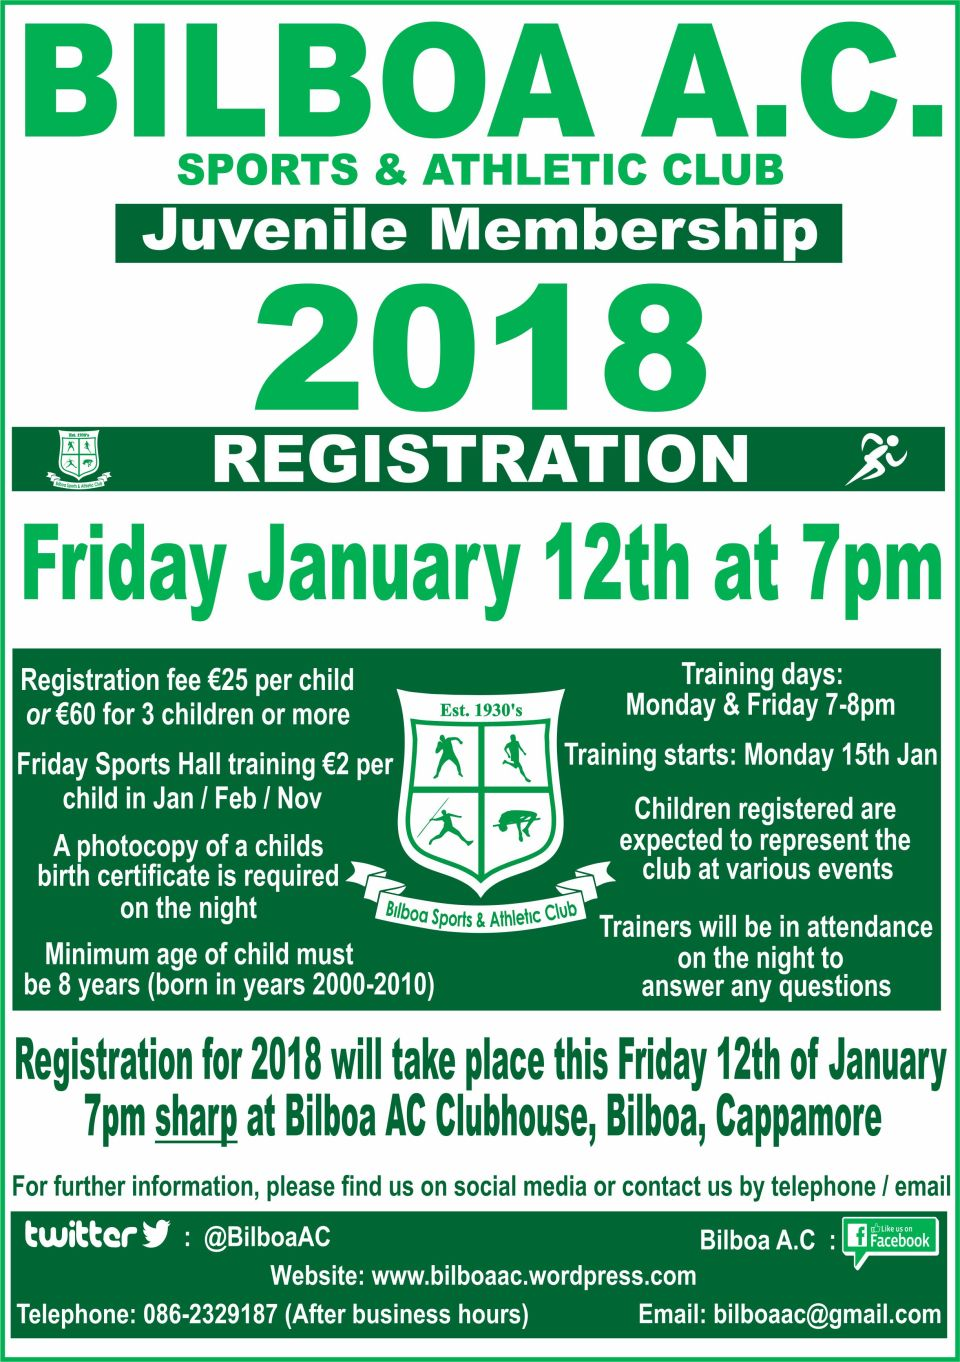 Bilboa AC Juvenile Registration Flyer 08-01-18 (1)